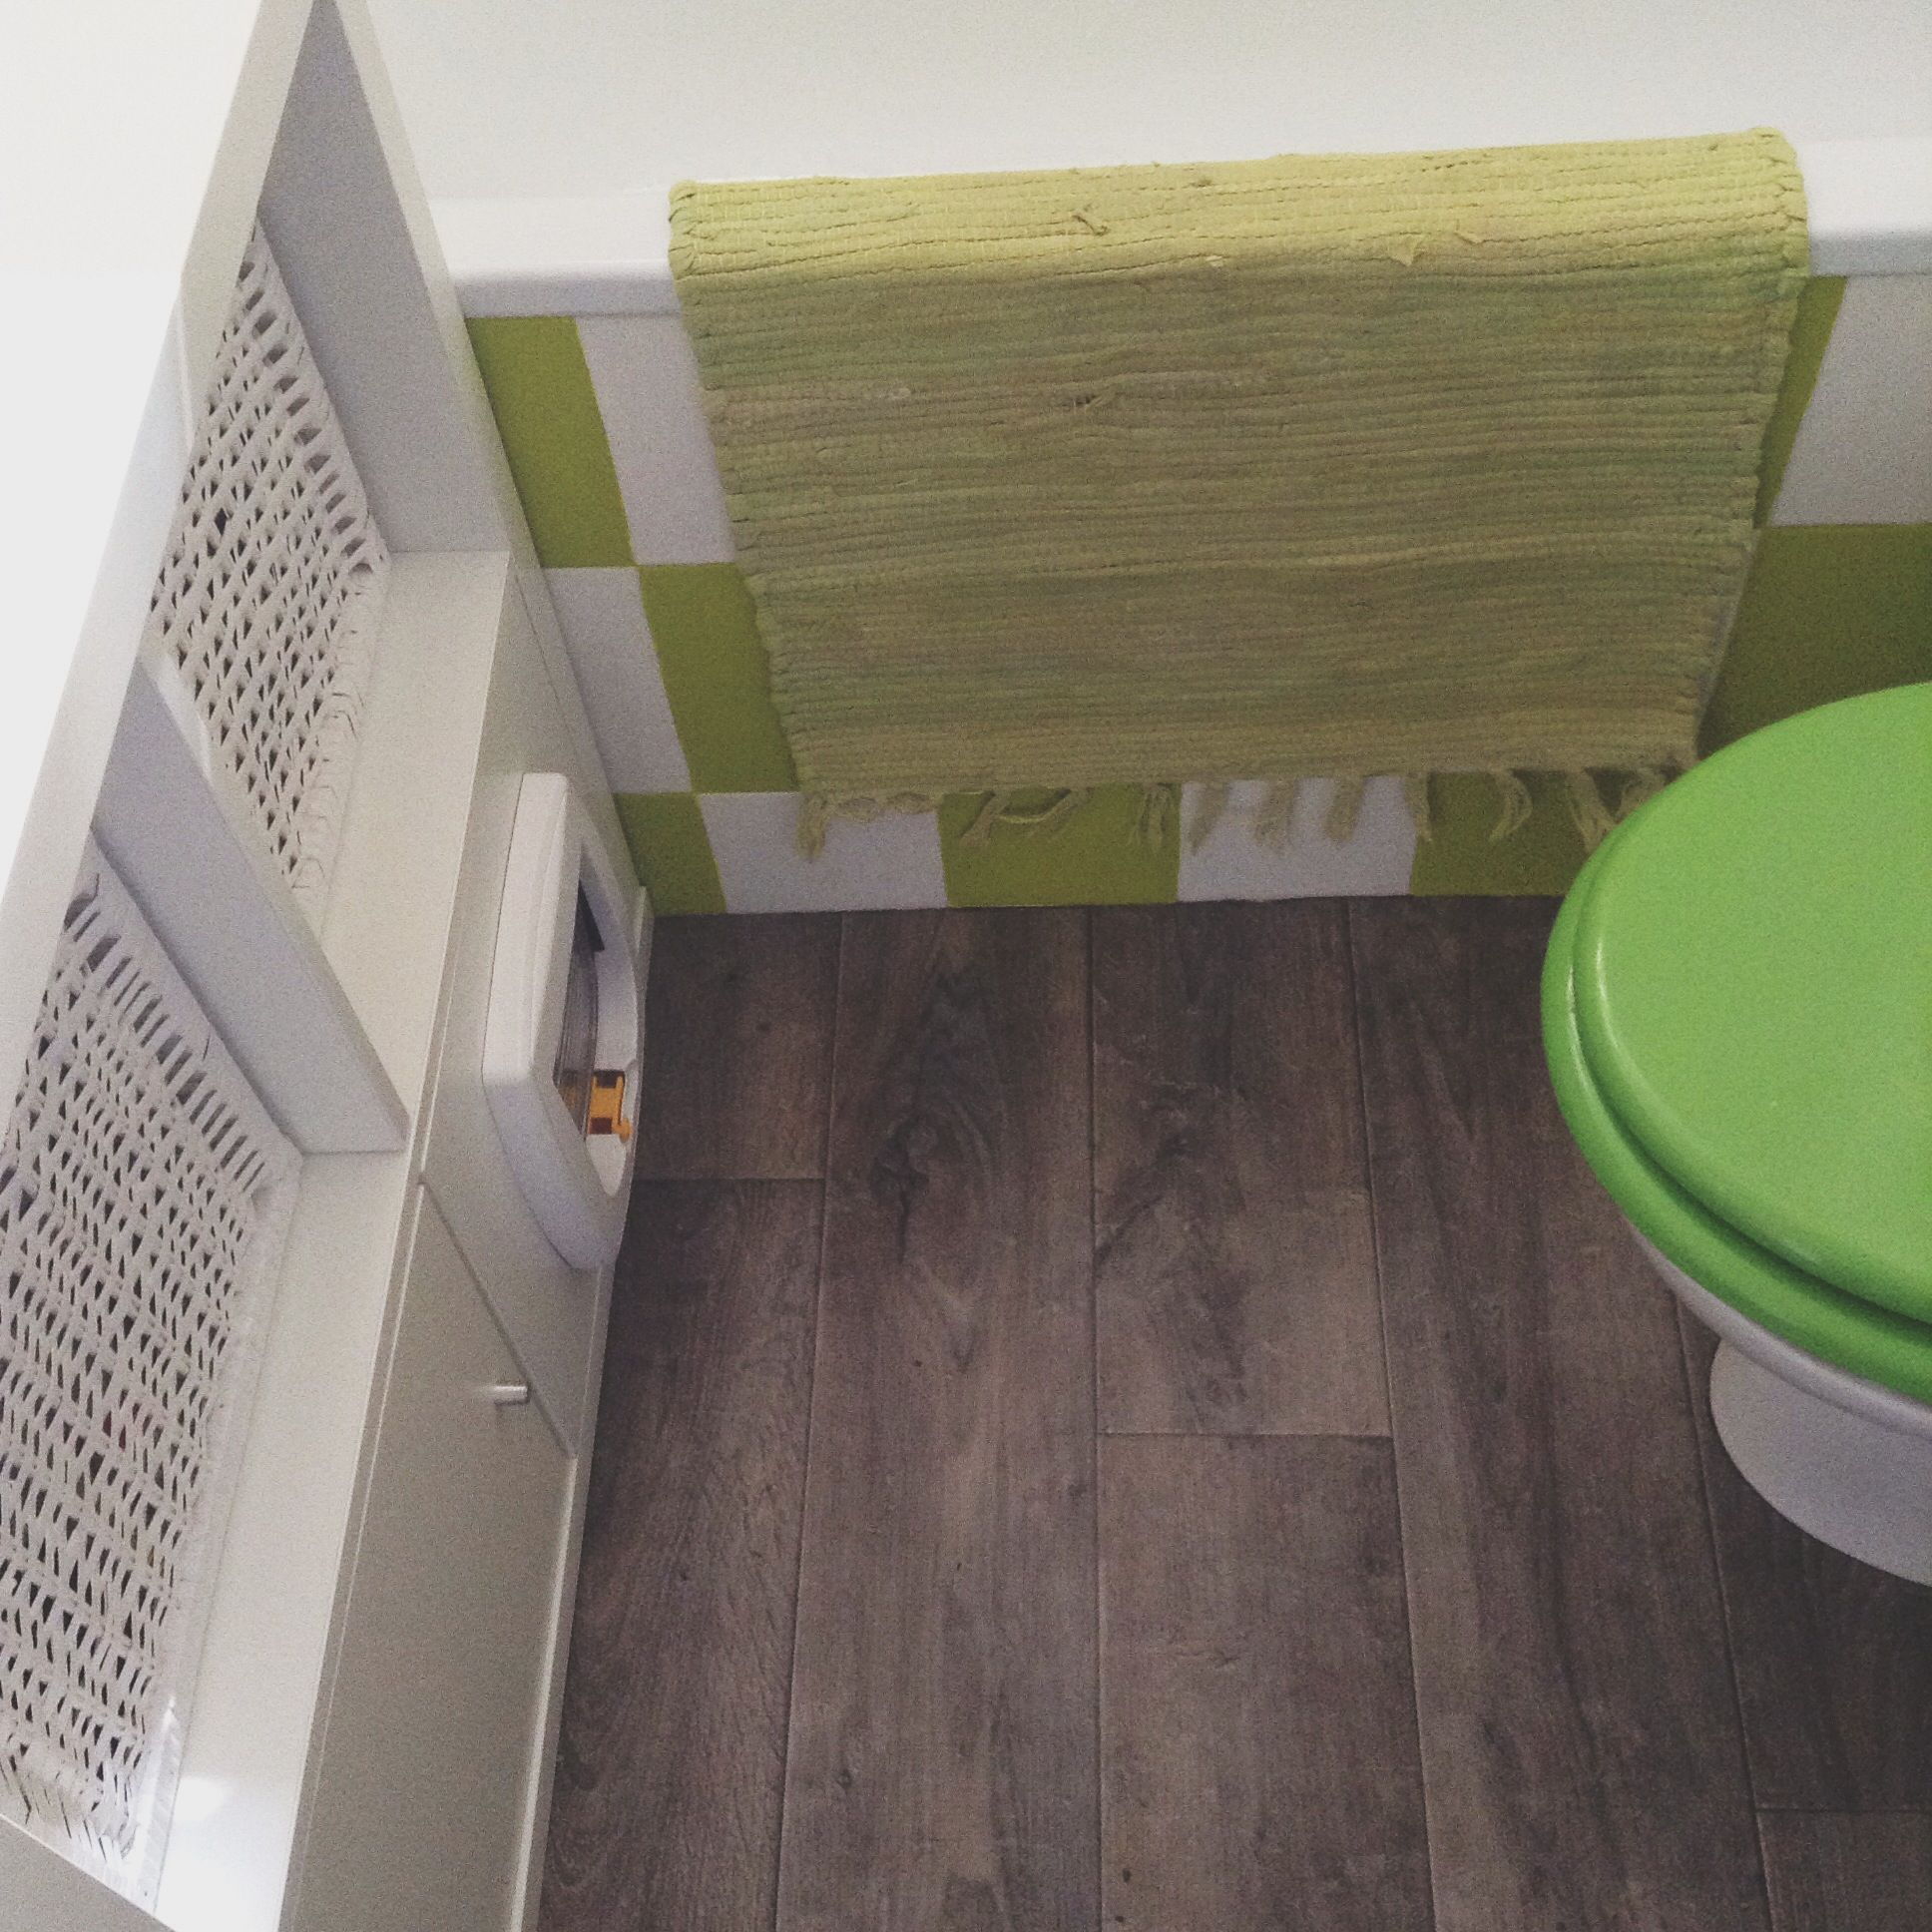 Creative Litter Box Solutions